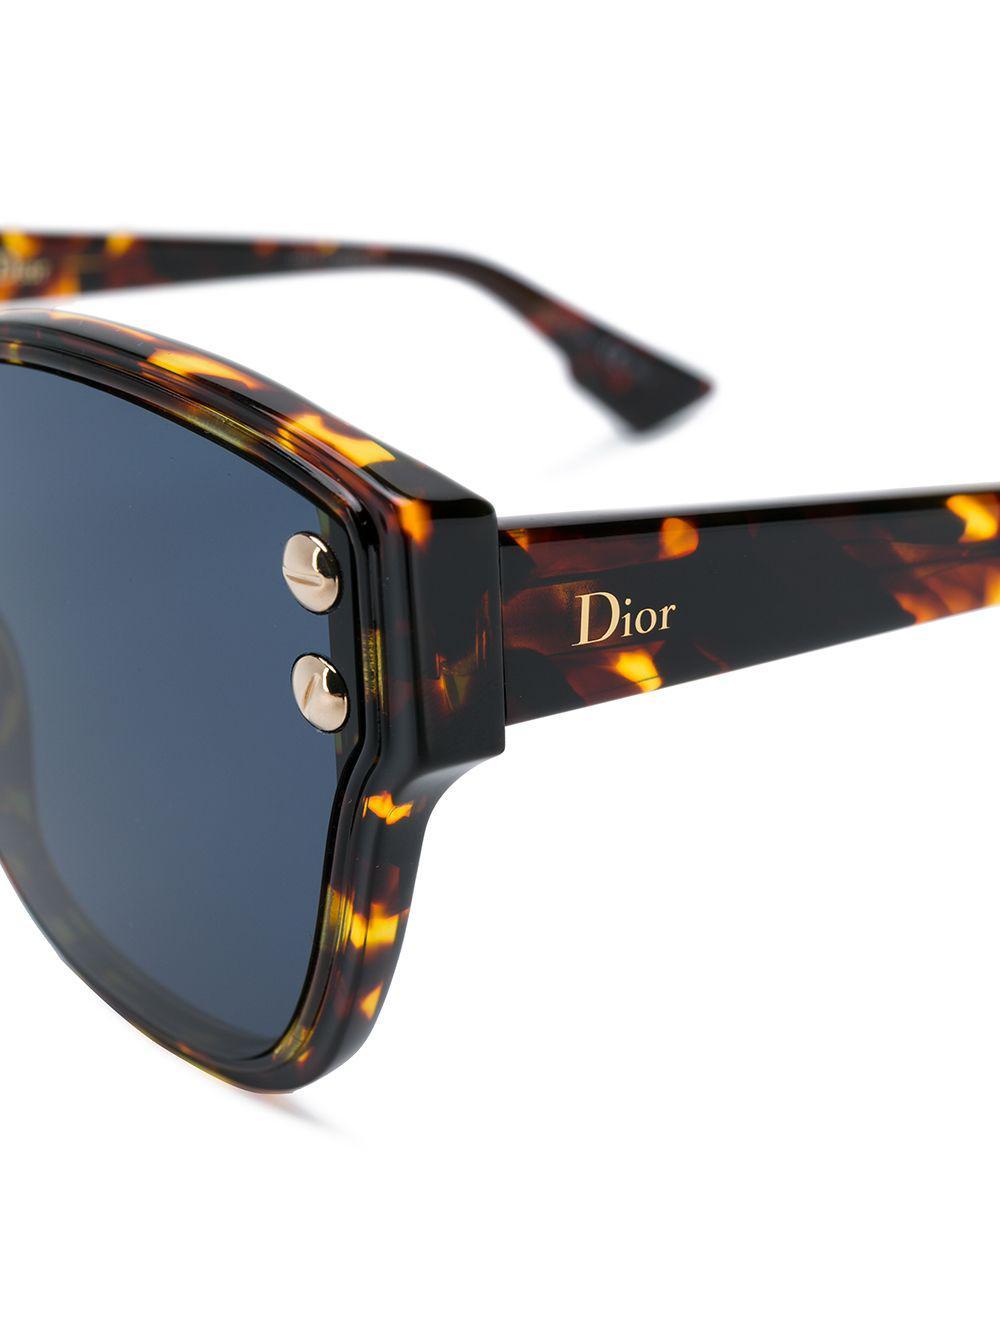 67f3b8b96d Dior Dior Addict 3 Sunglasses in Brown - Lyst